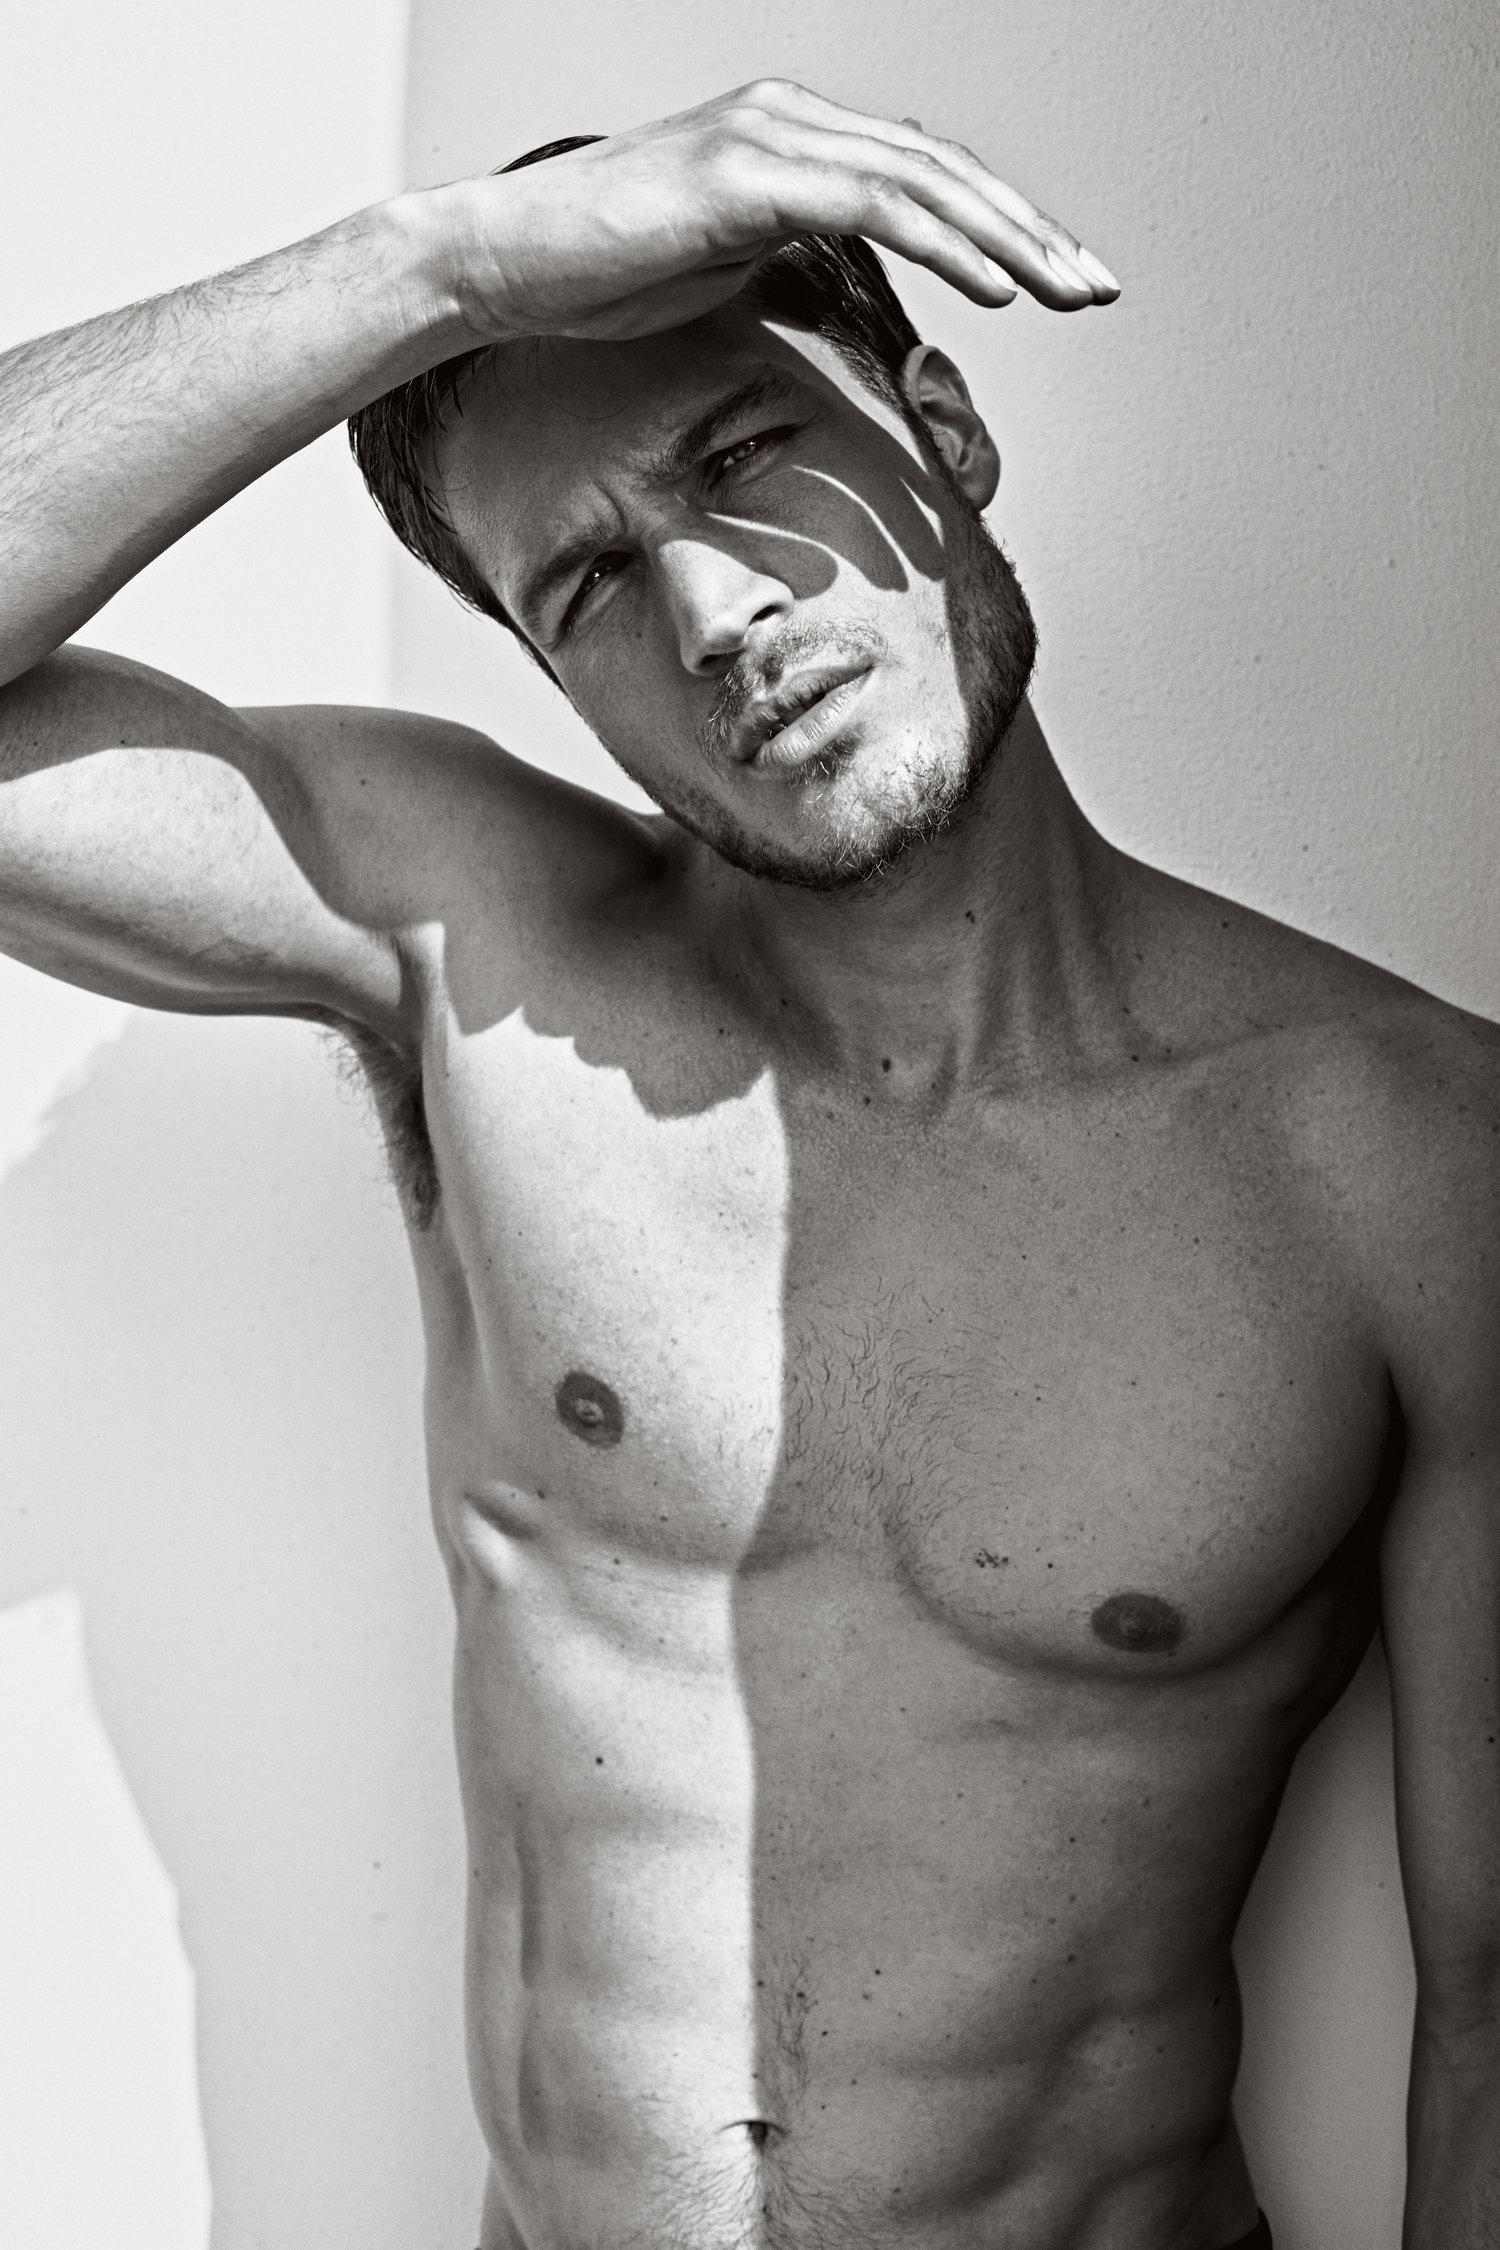 Adon Exclusive: Model Damian Licheri By Vicente Mosto